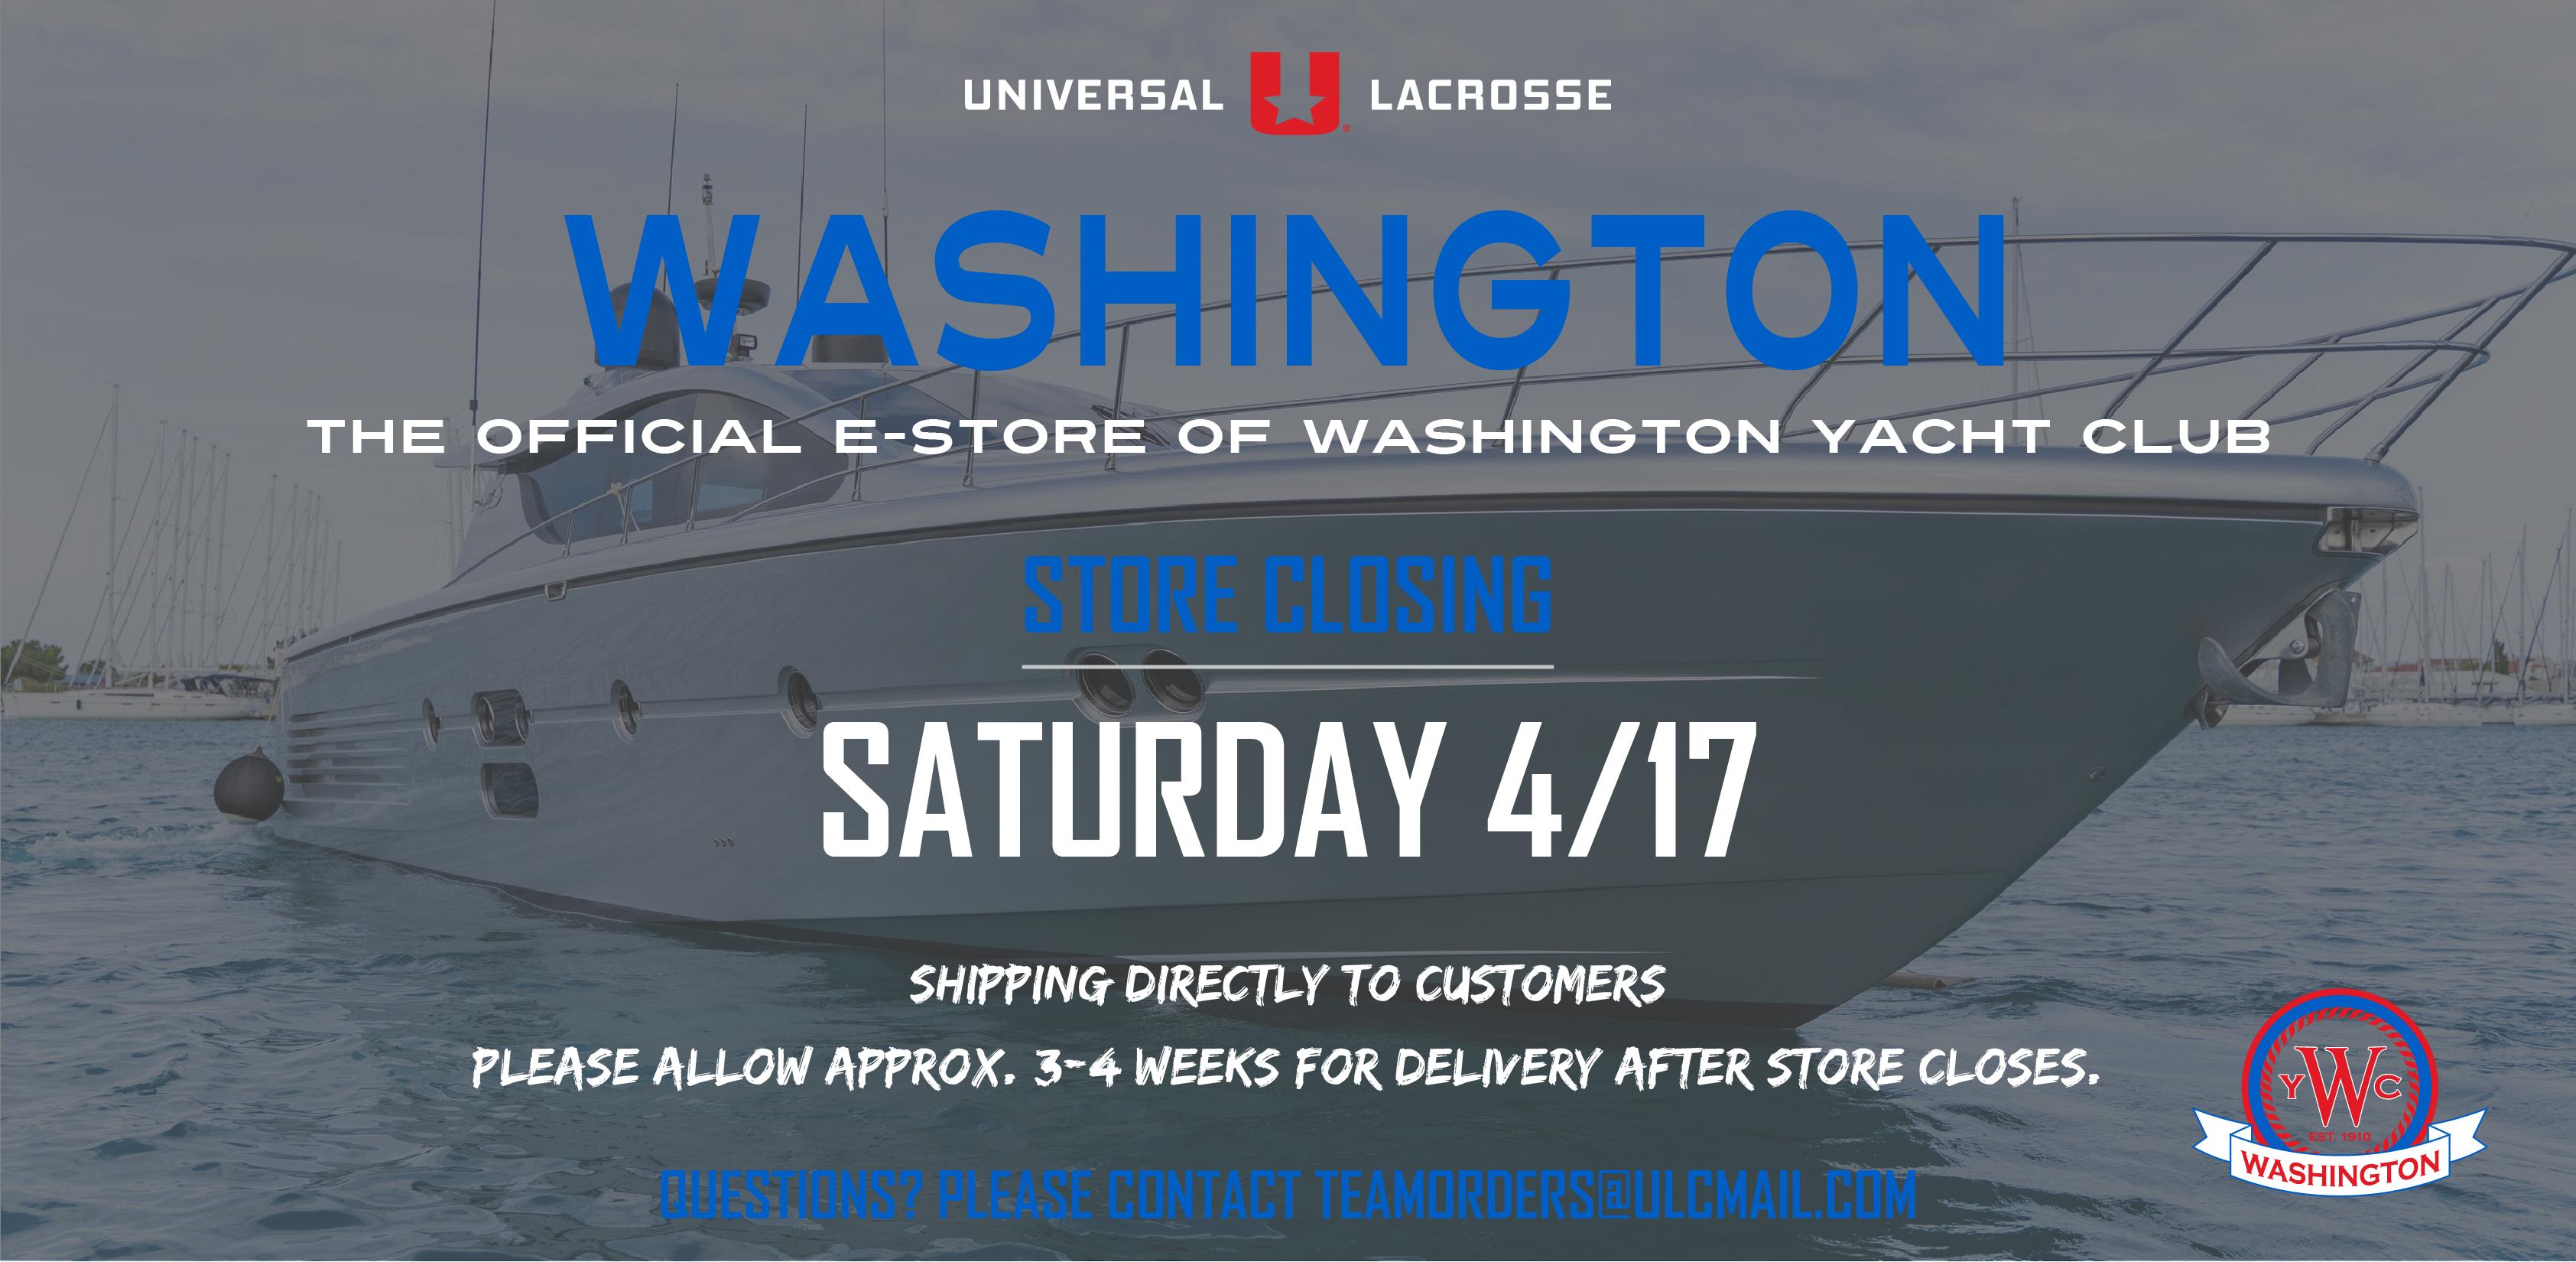 Washington Yacht Club